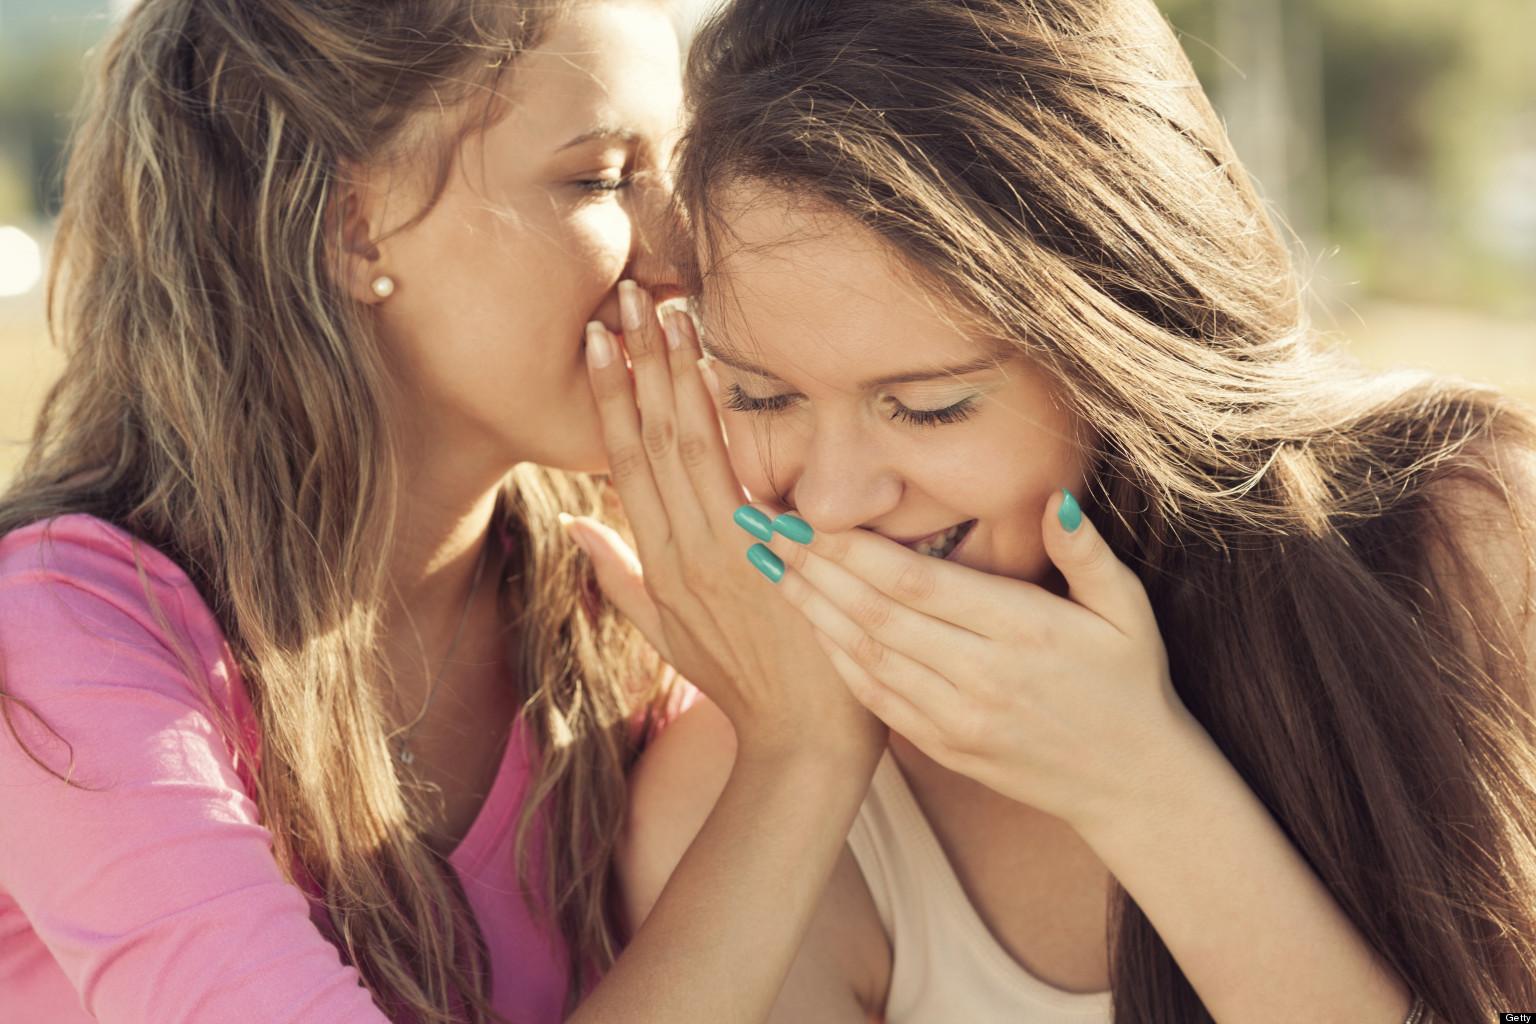 Keeping Secret Confessions Between Us